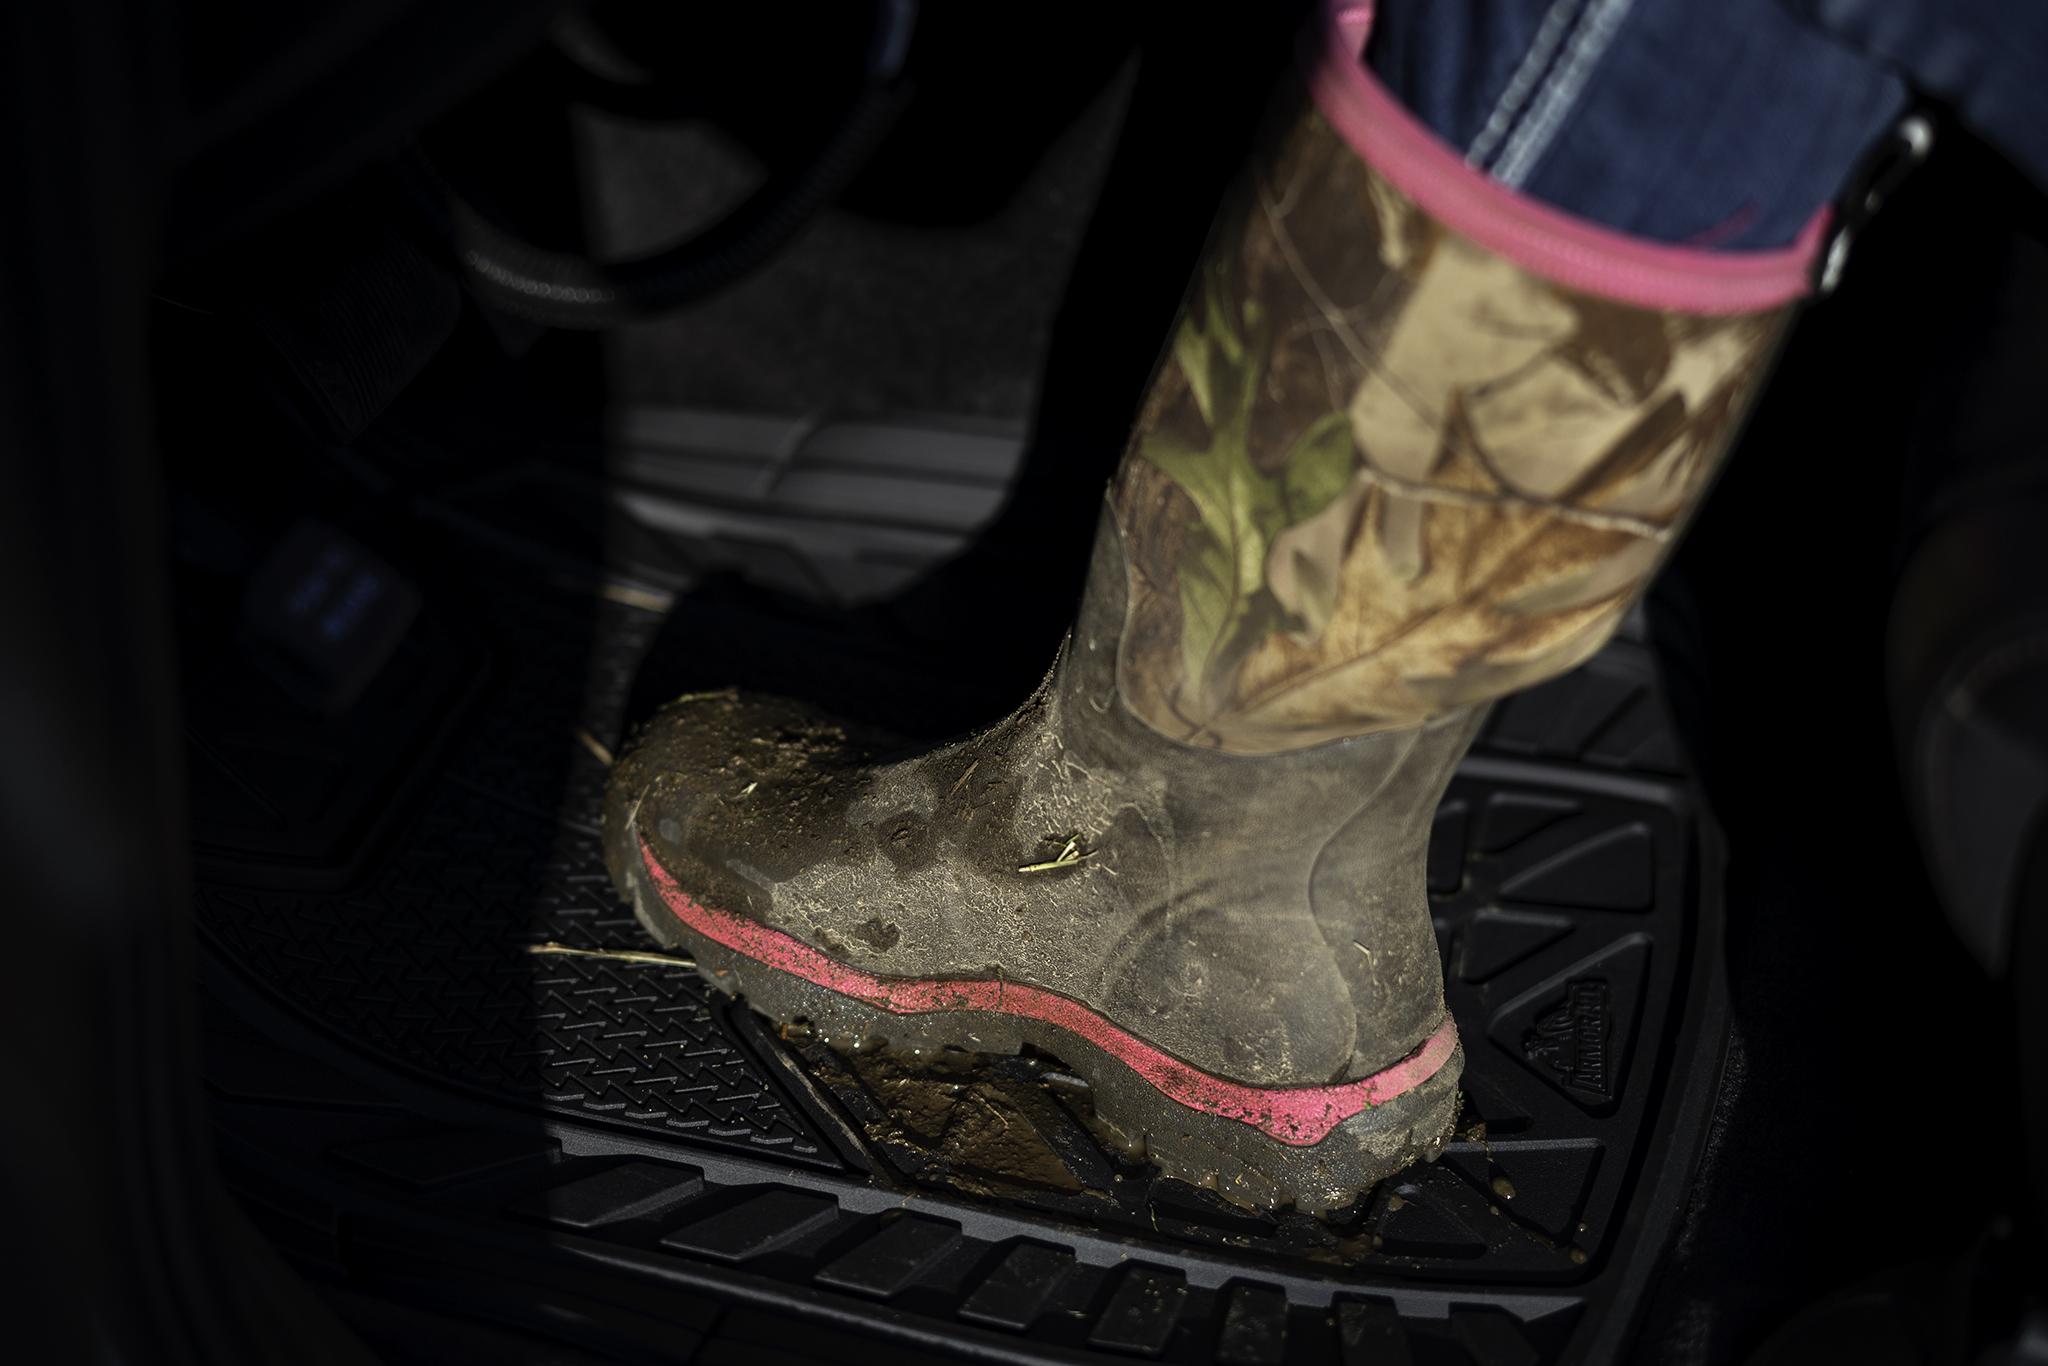 Armor All Floor Mats - Brown Boots.jpg